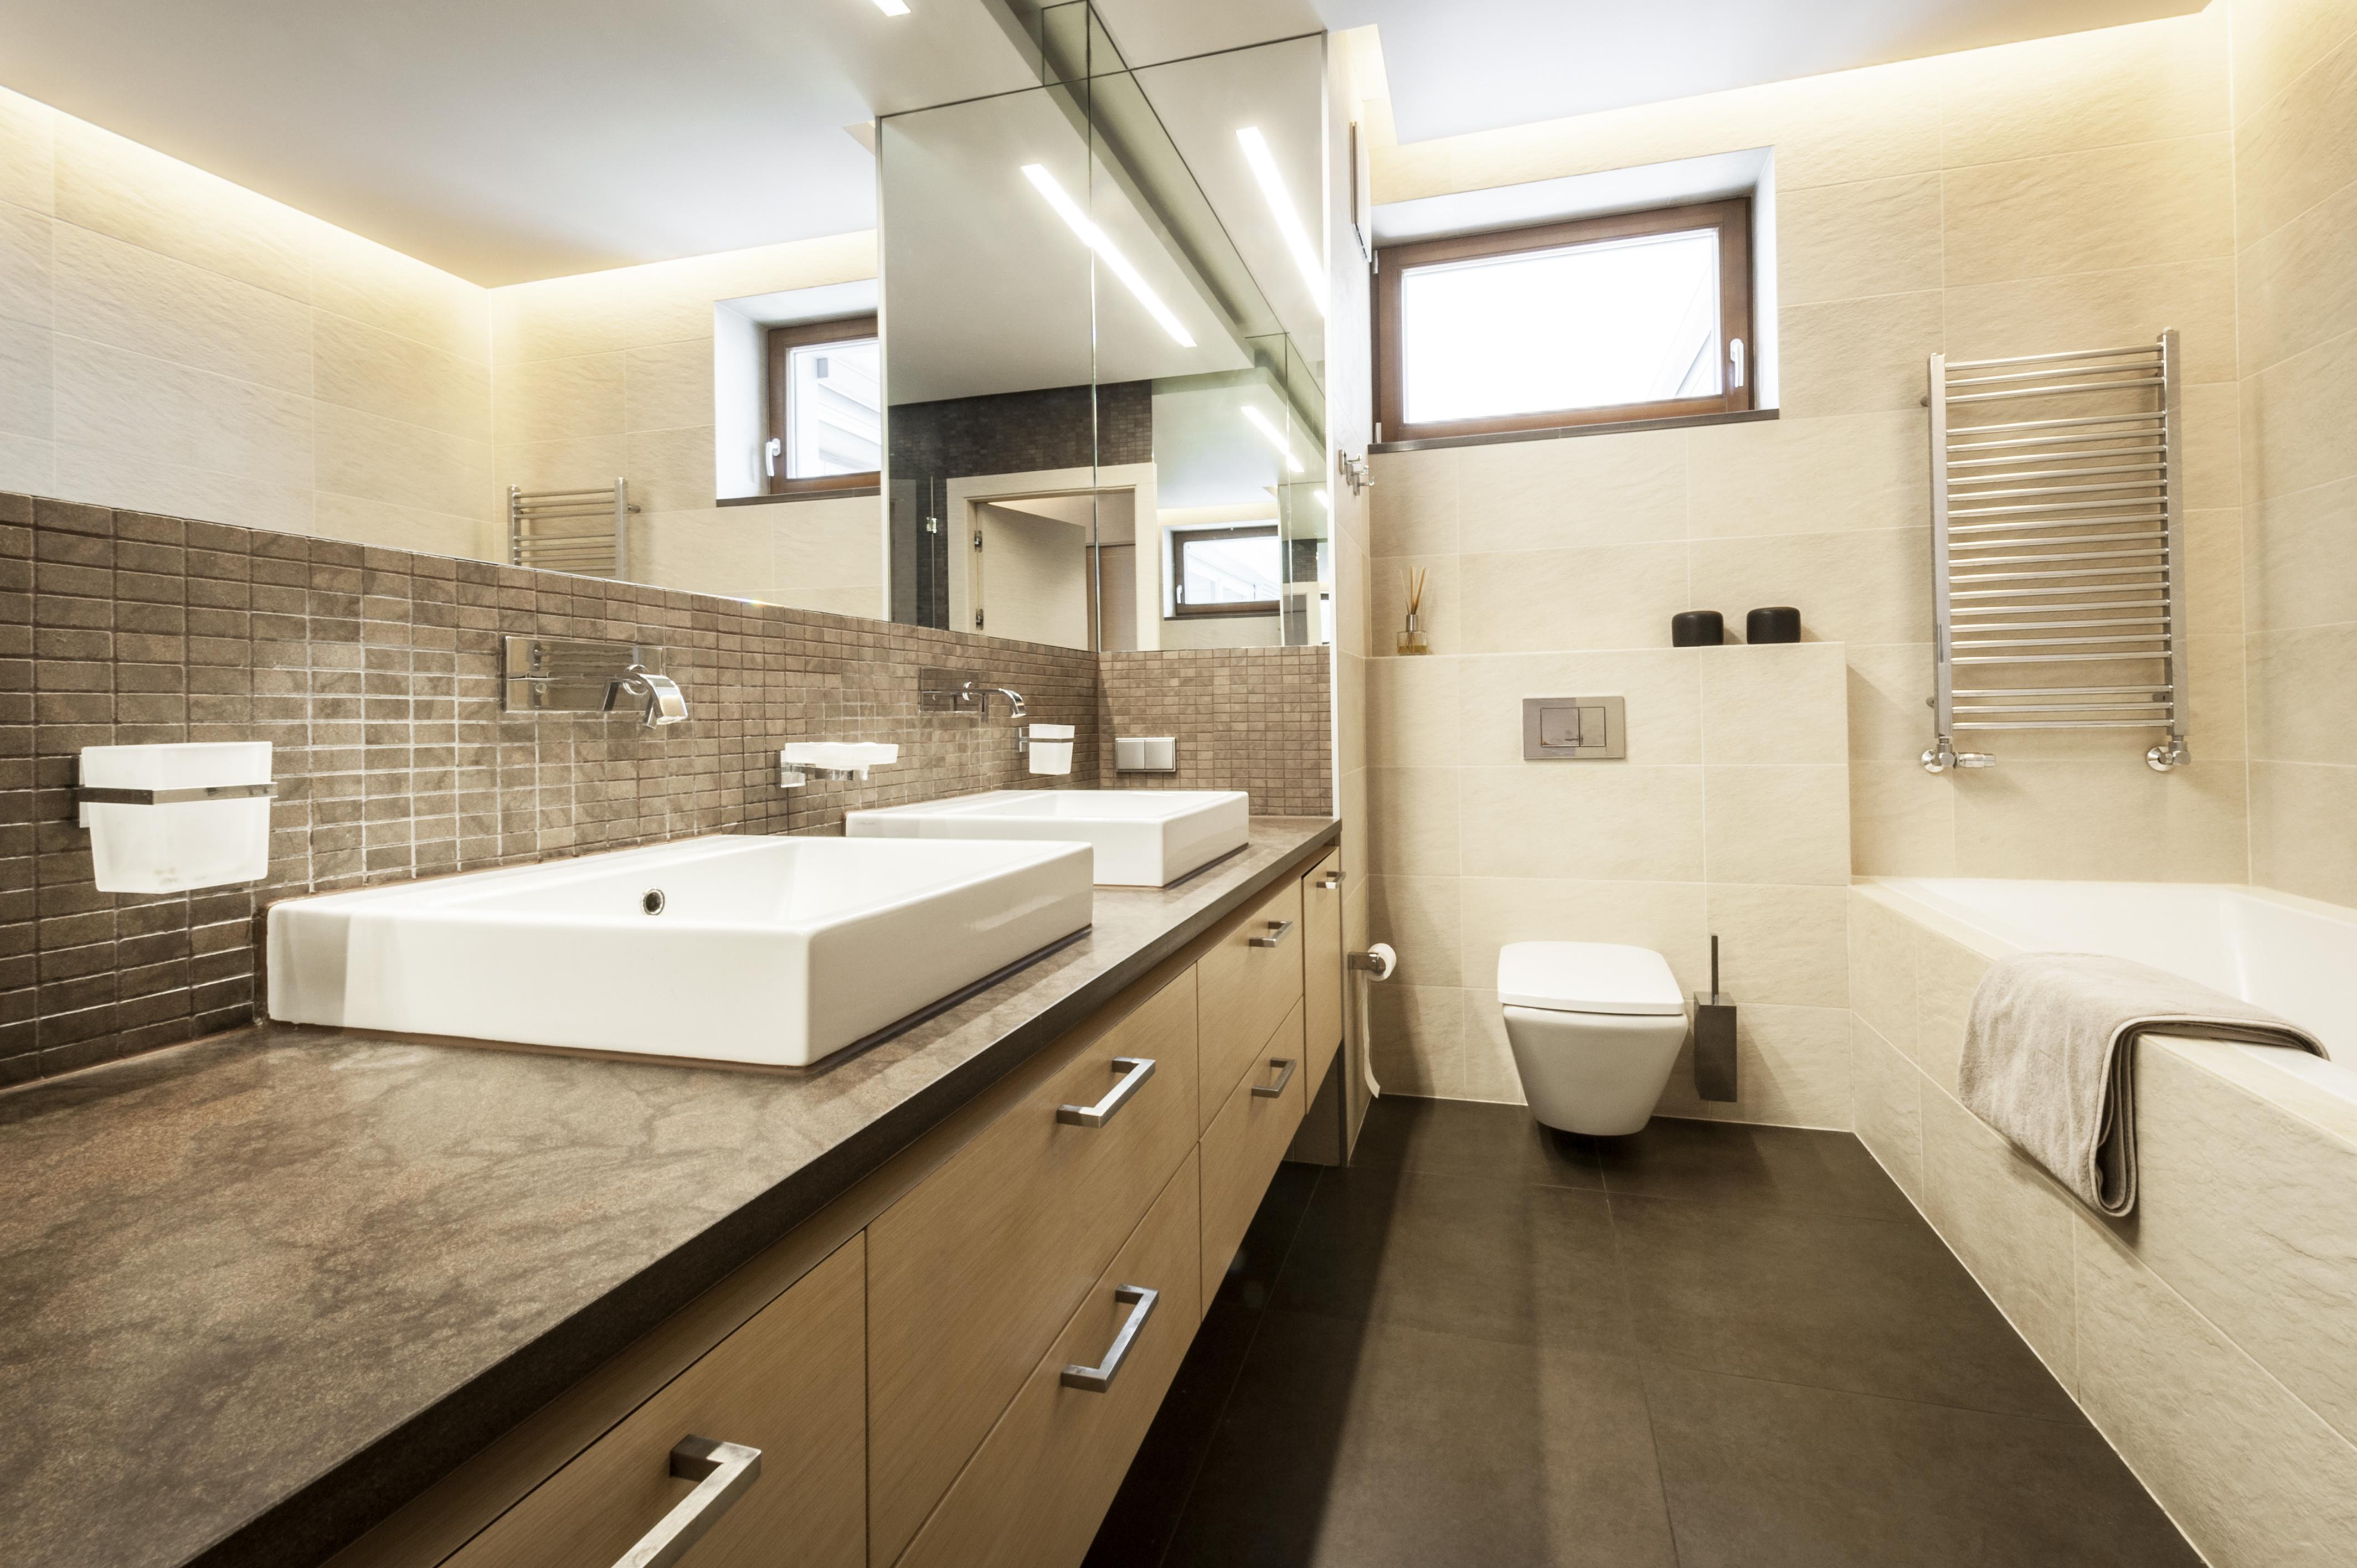 Mobili salvaspazio bagno elegant bagno sospeso completo di lavabo